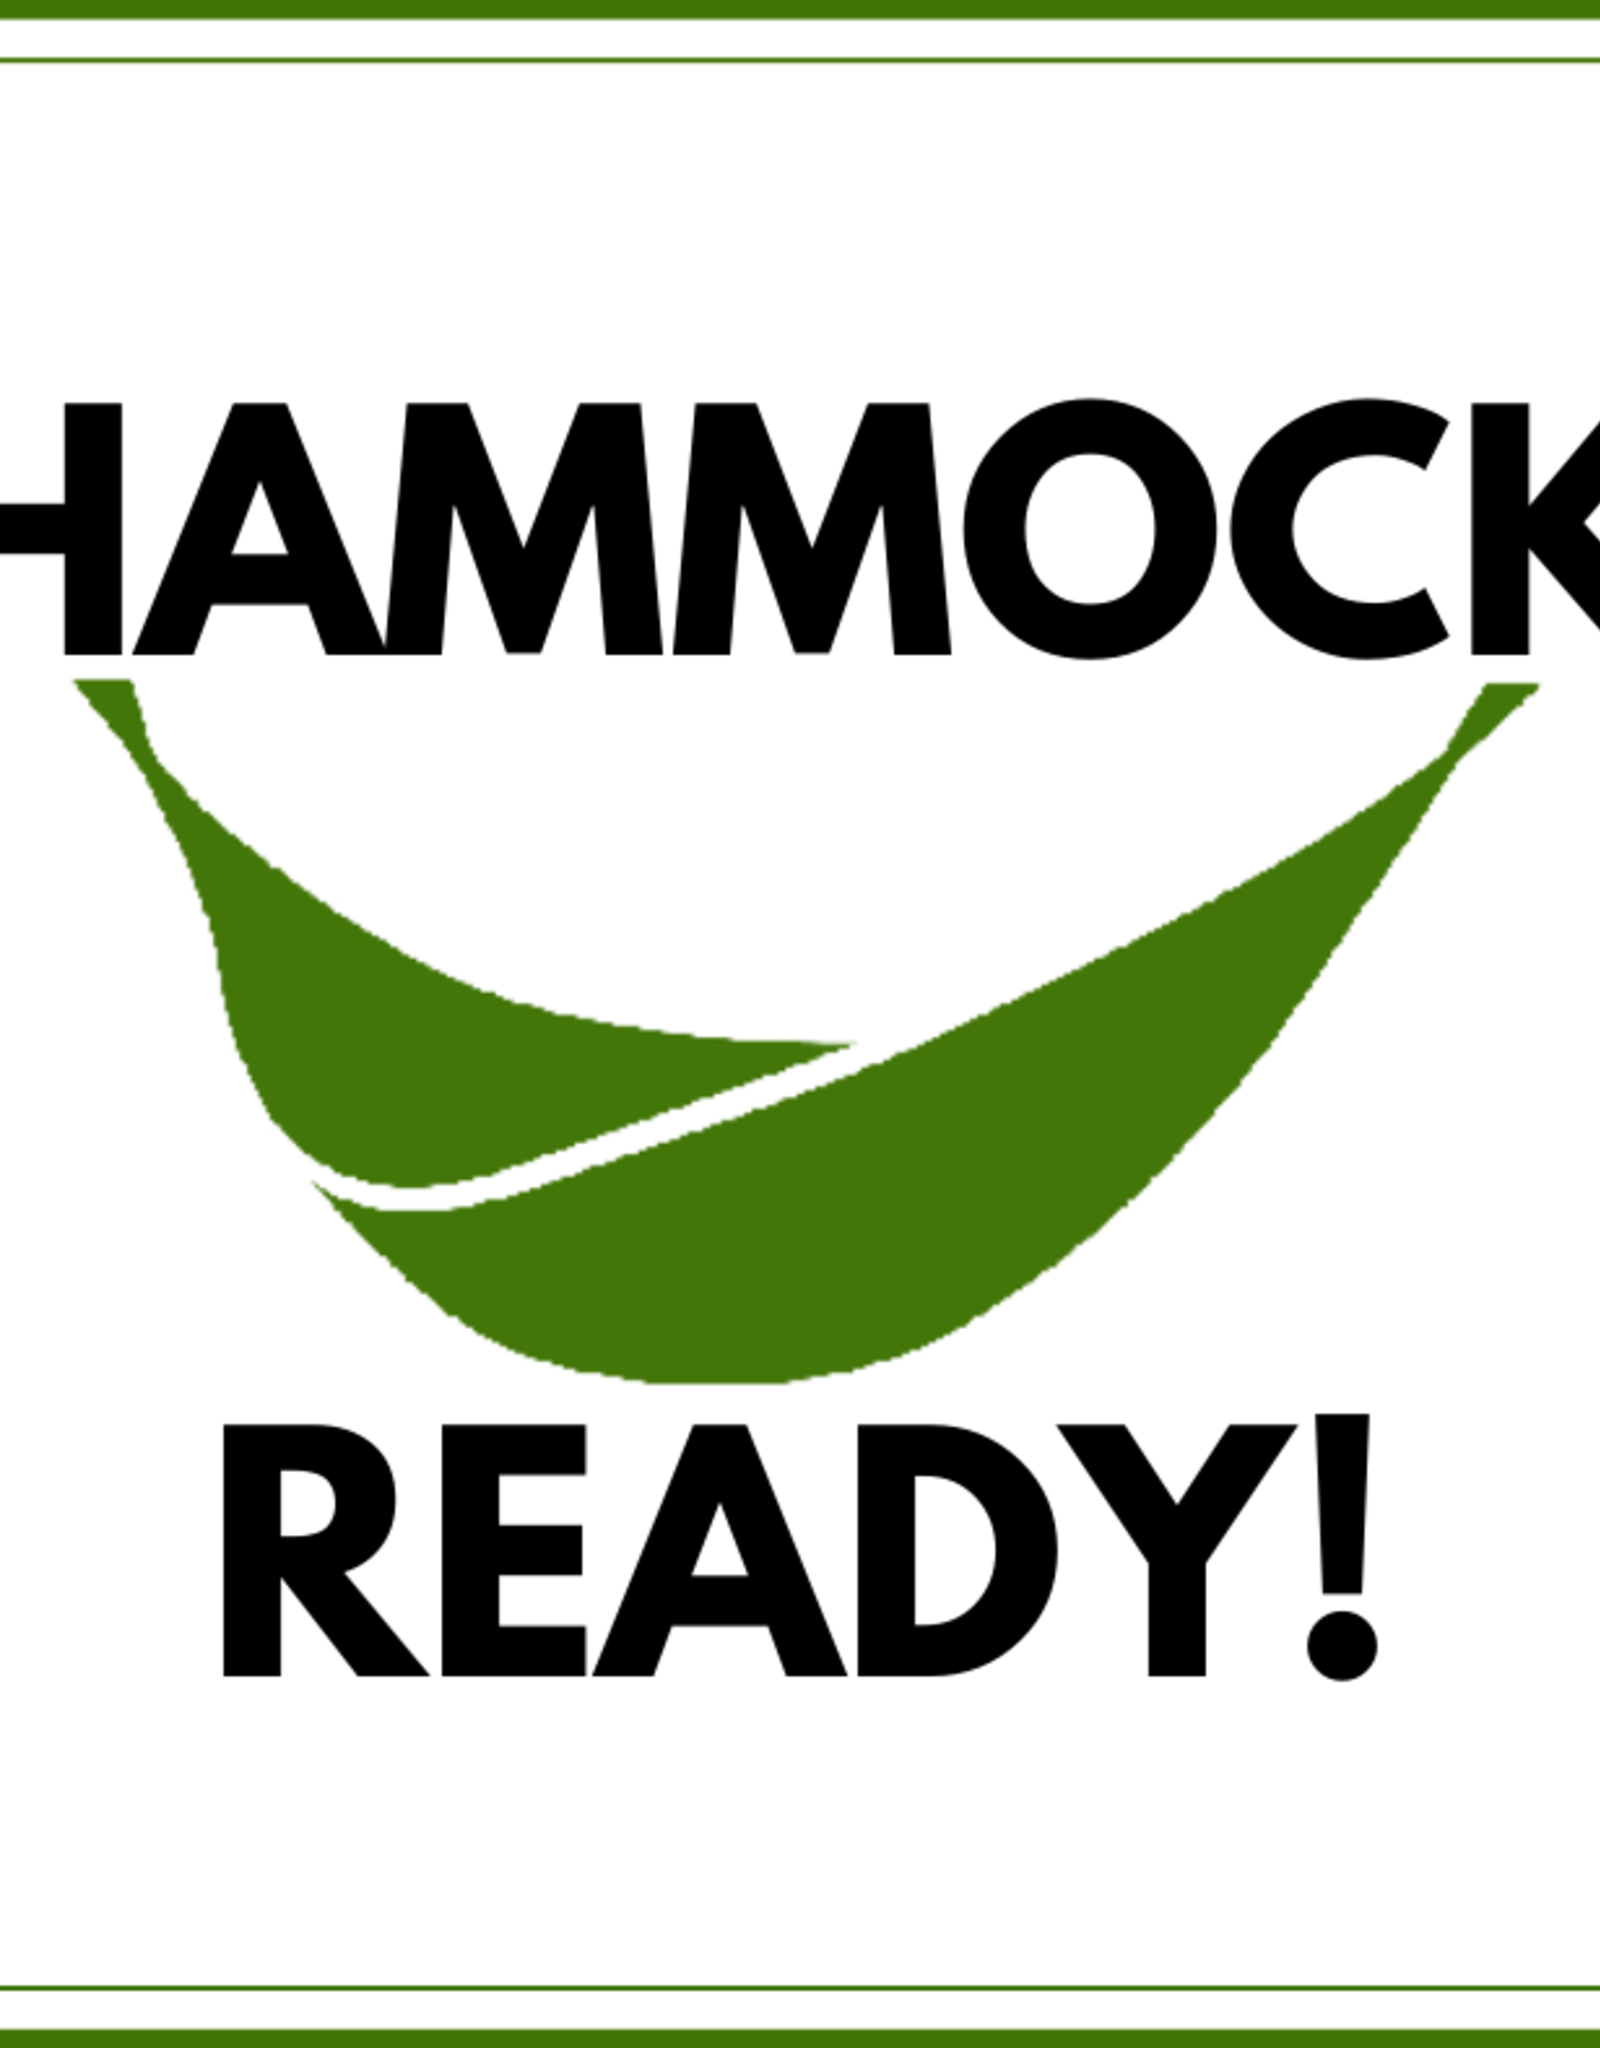 Dutch Hammock Store Hammock ready